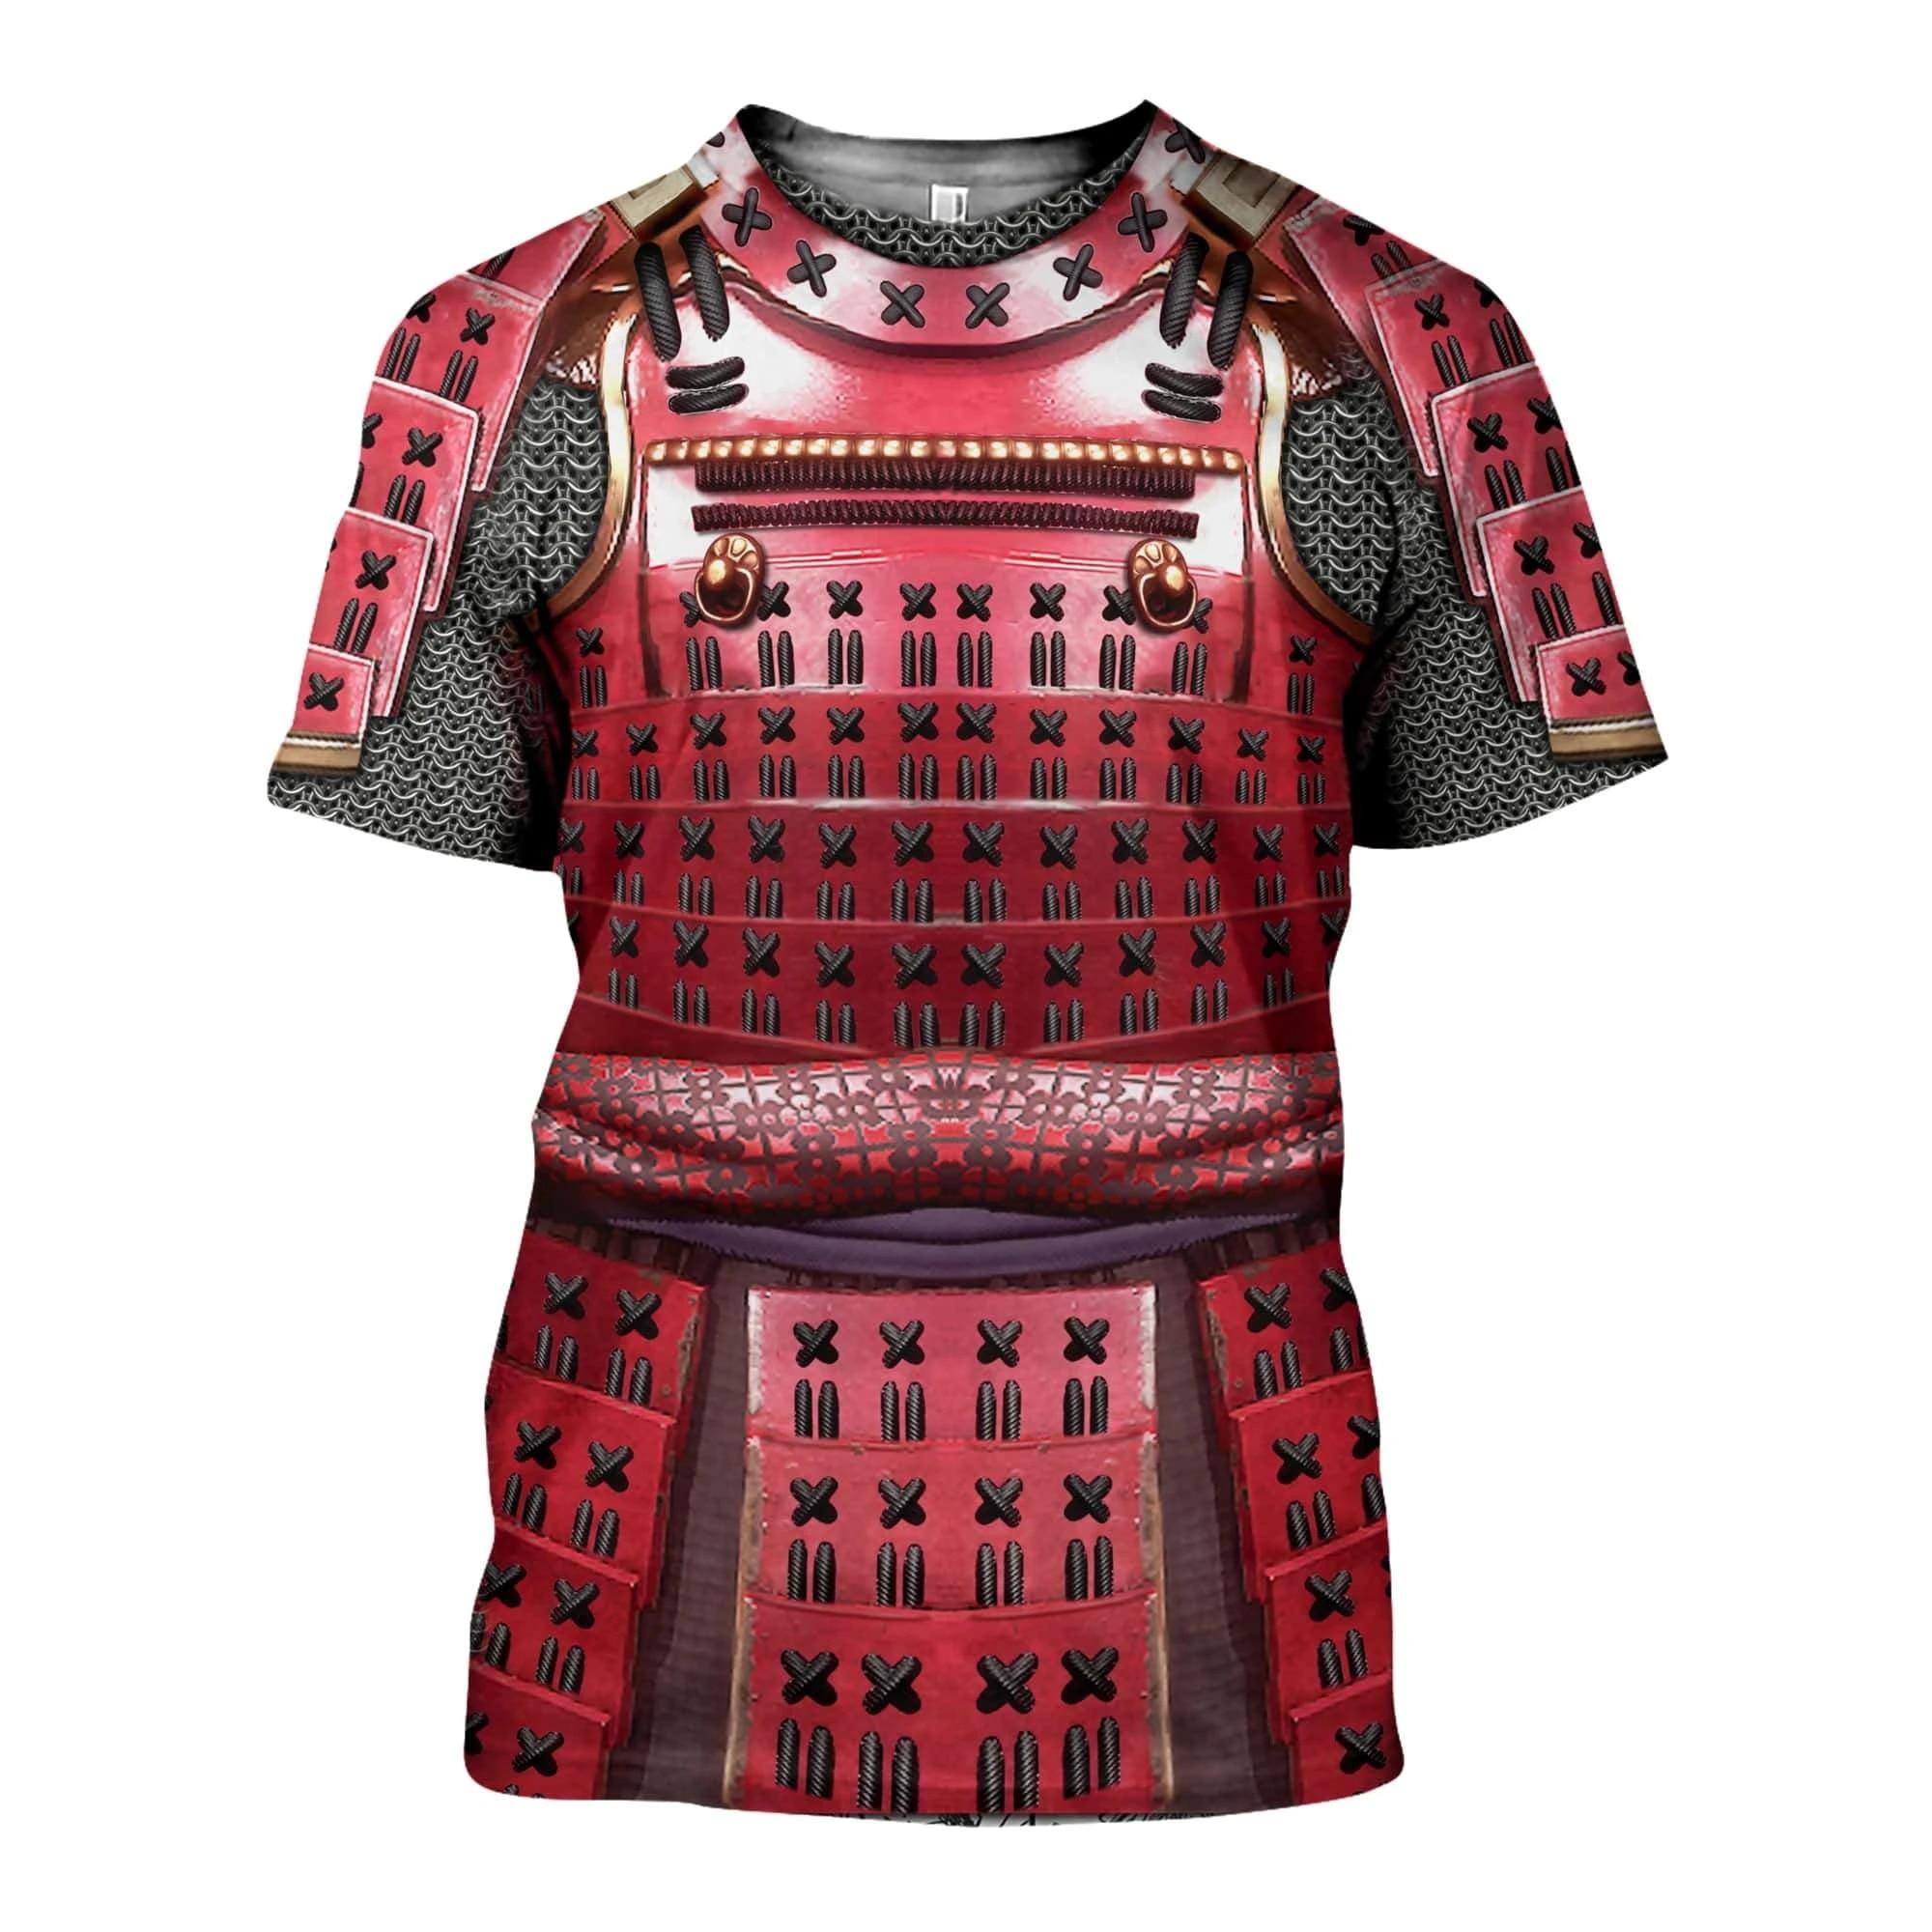 2020 New Summer T Shirts 3D Printed Samurai Armor Men Harajuku Fashion Short Sleeve Shirt Street Casual Unisex T-shirt Top